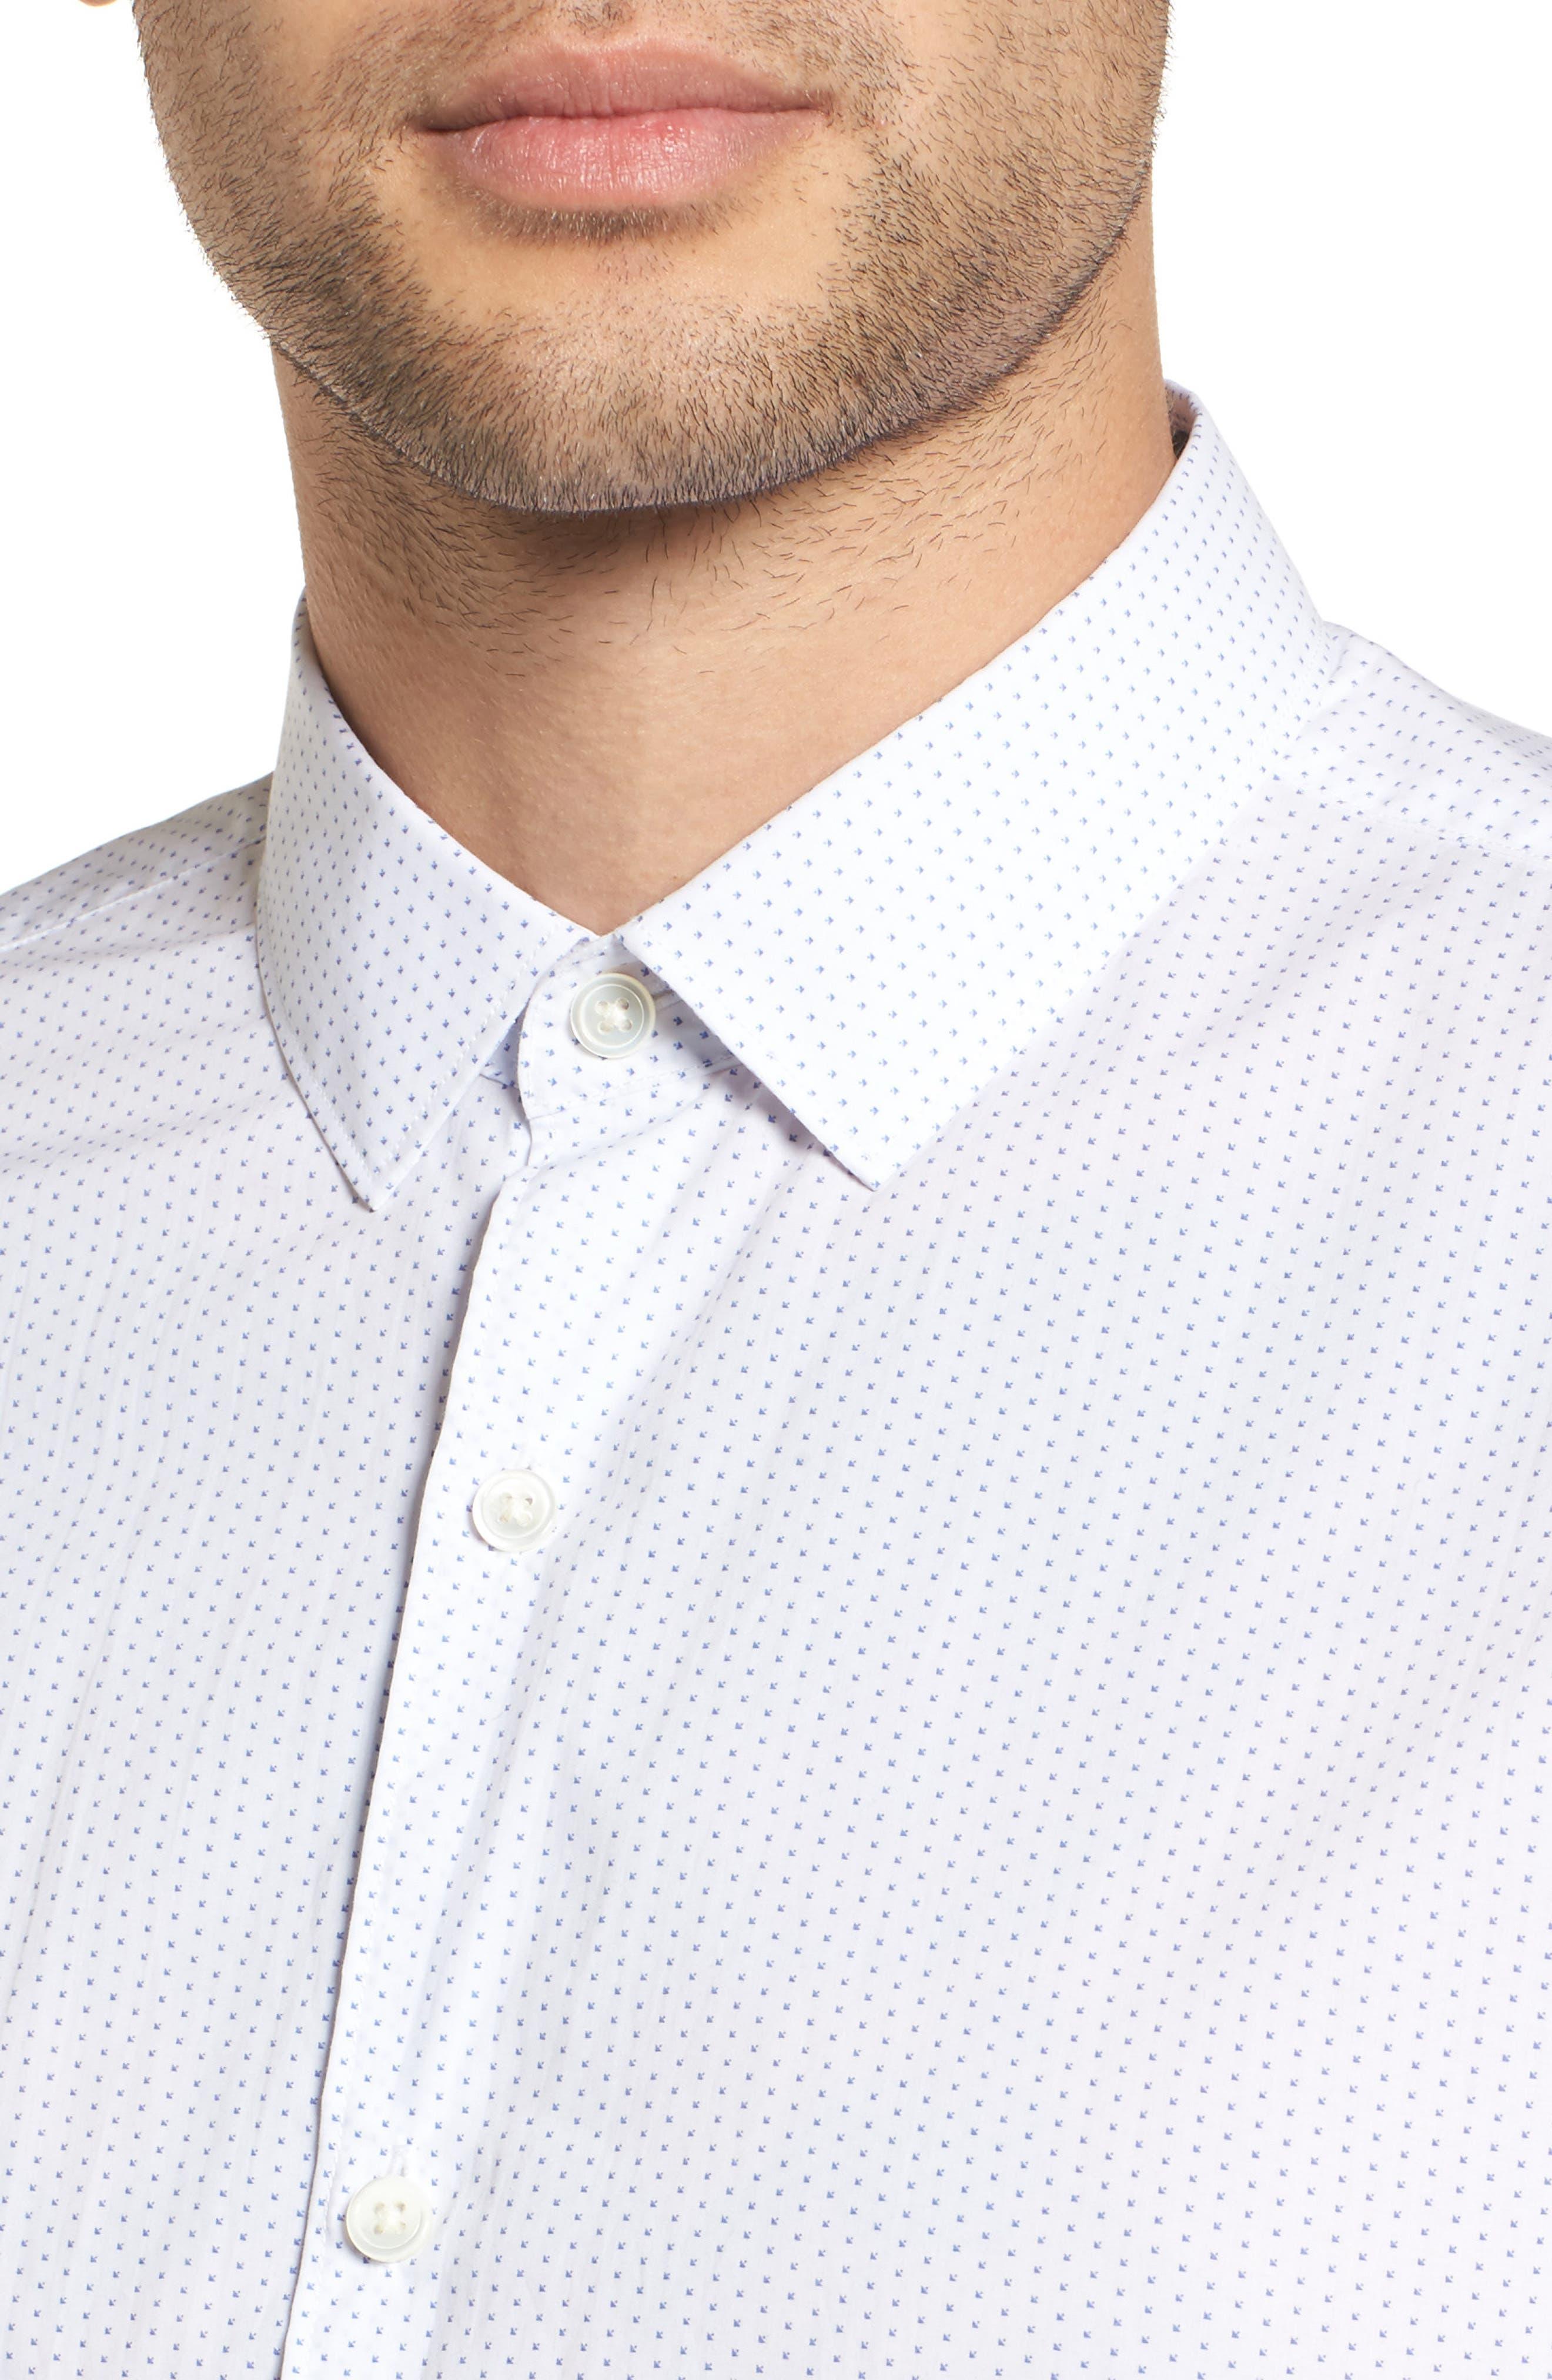 Murray Slim Fit Sport Shirt,                             Alternate thumbnail 4, color,                             100